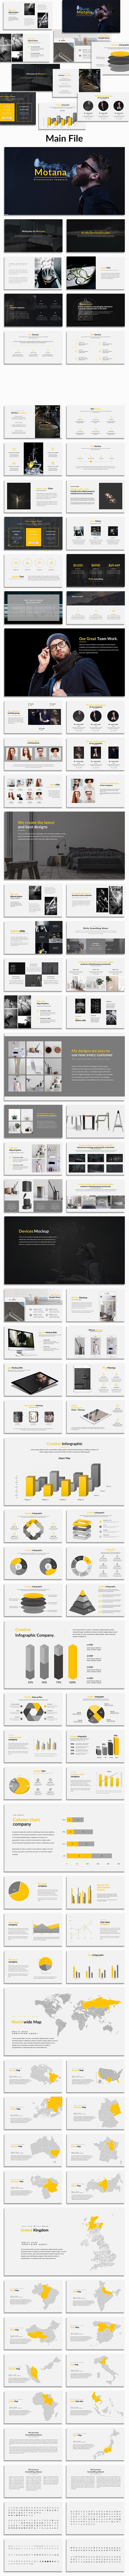 Motana Multipurpose Keynote Template - Creative Keynote Templates